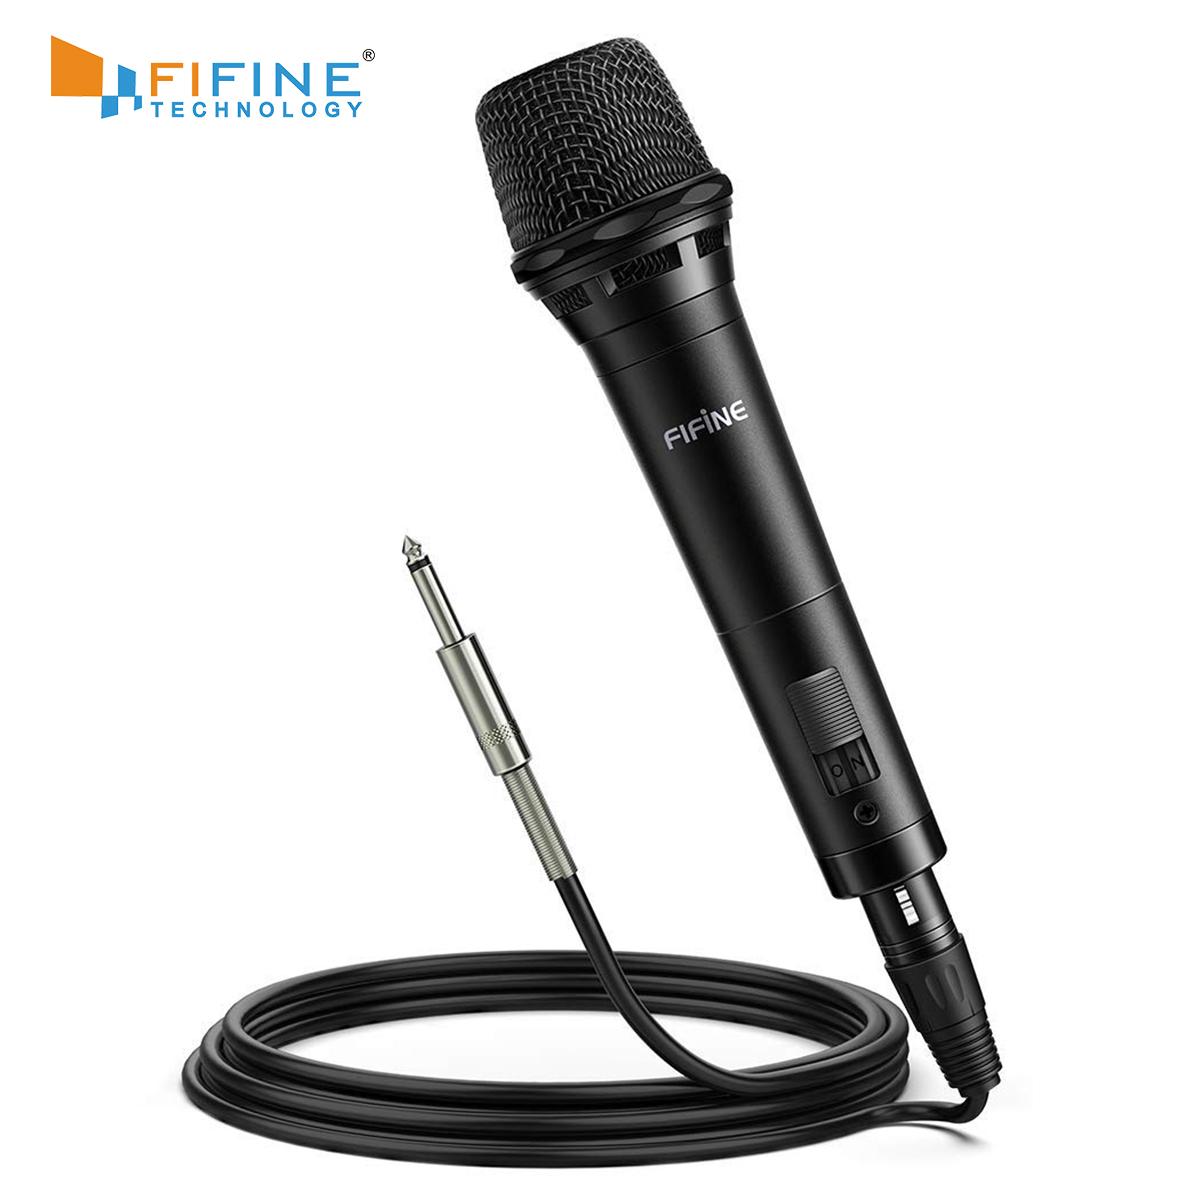 Fifine Tahun Gereja Tahap Karaoke Dinamis Genggam Nirkabel Konferensi Mikrofon